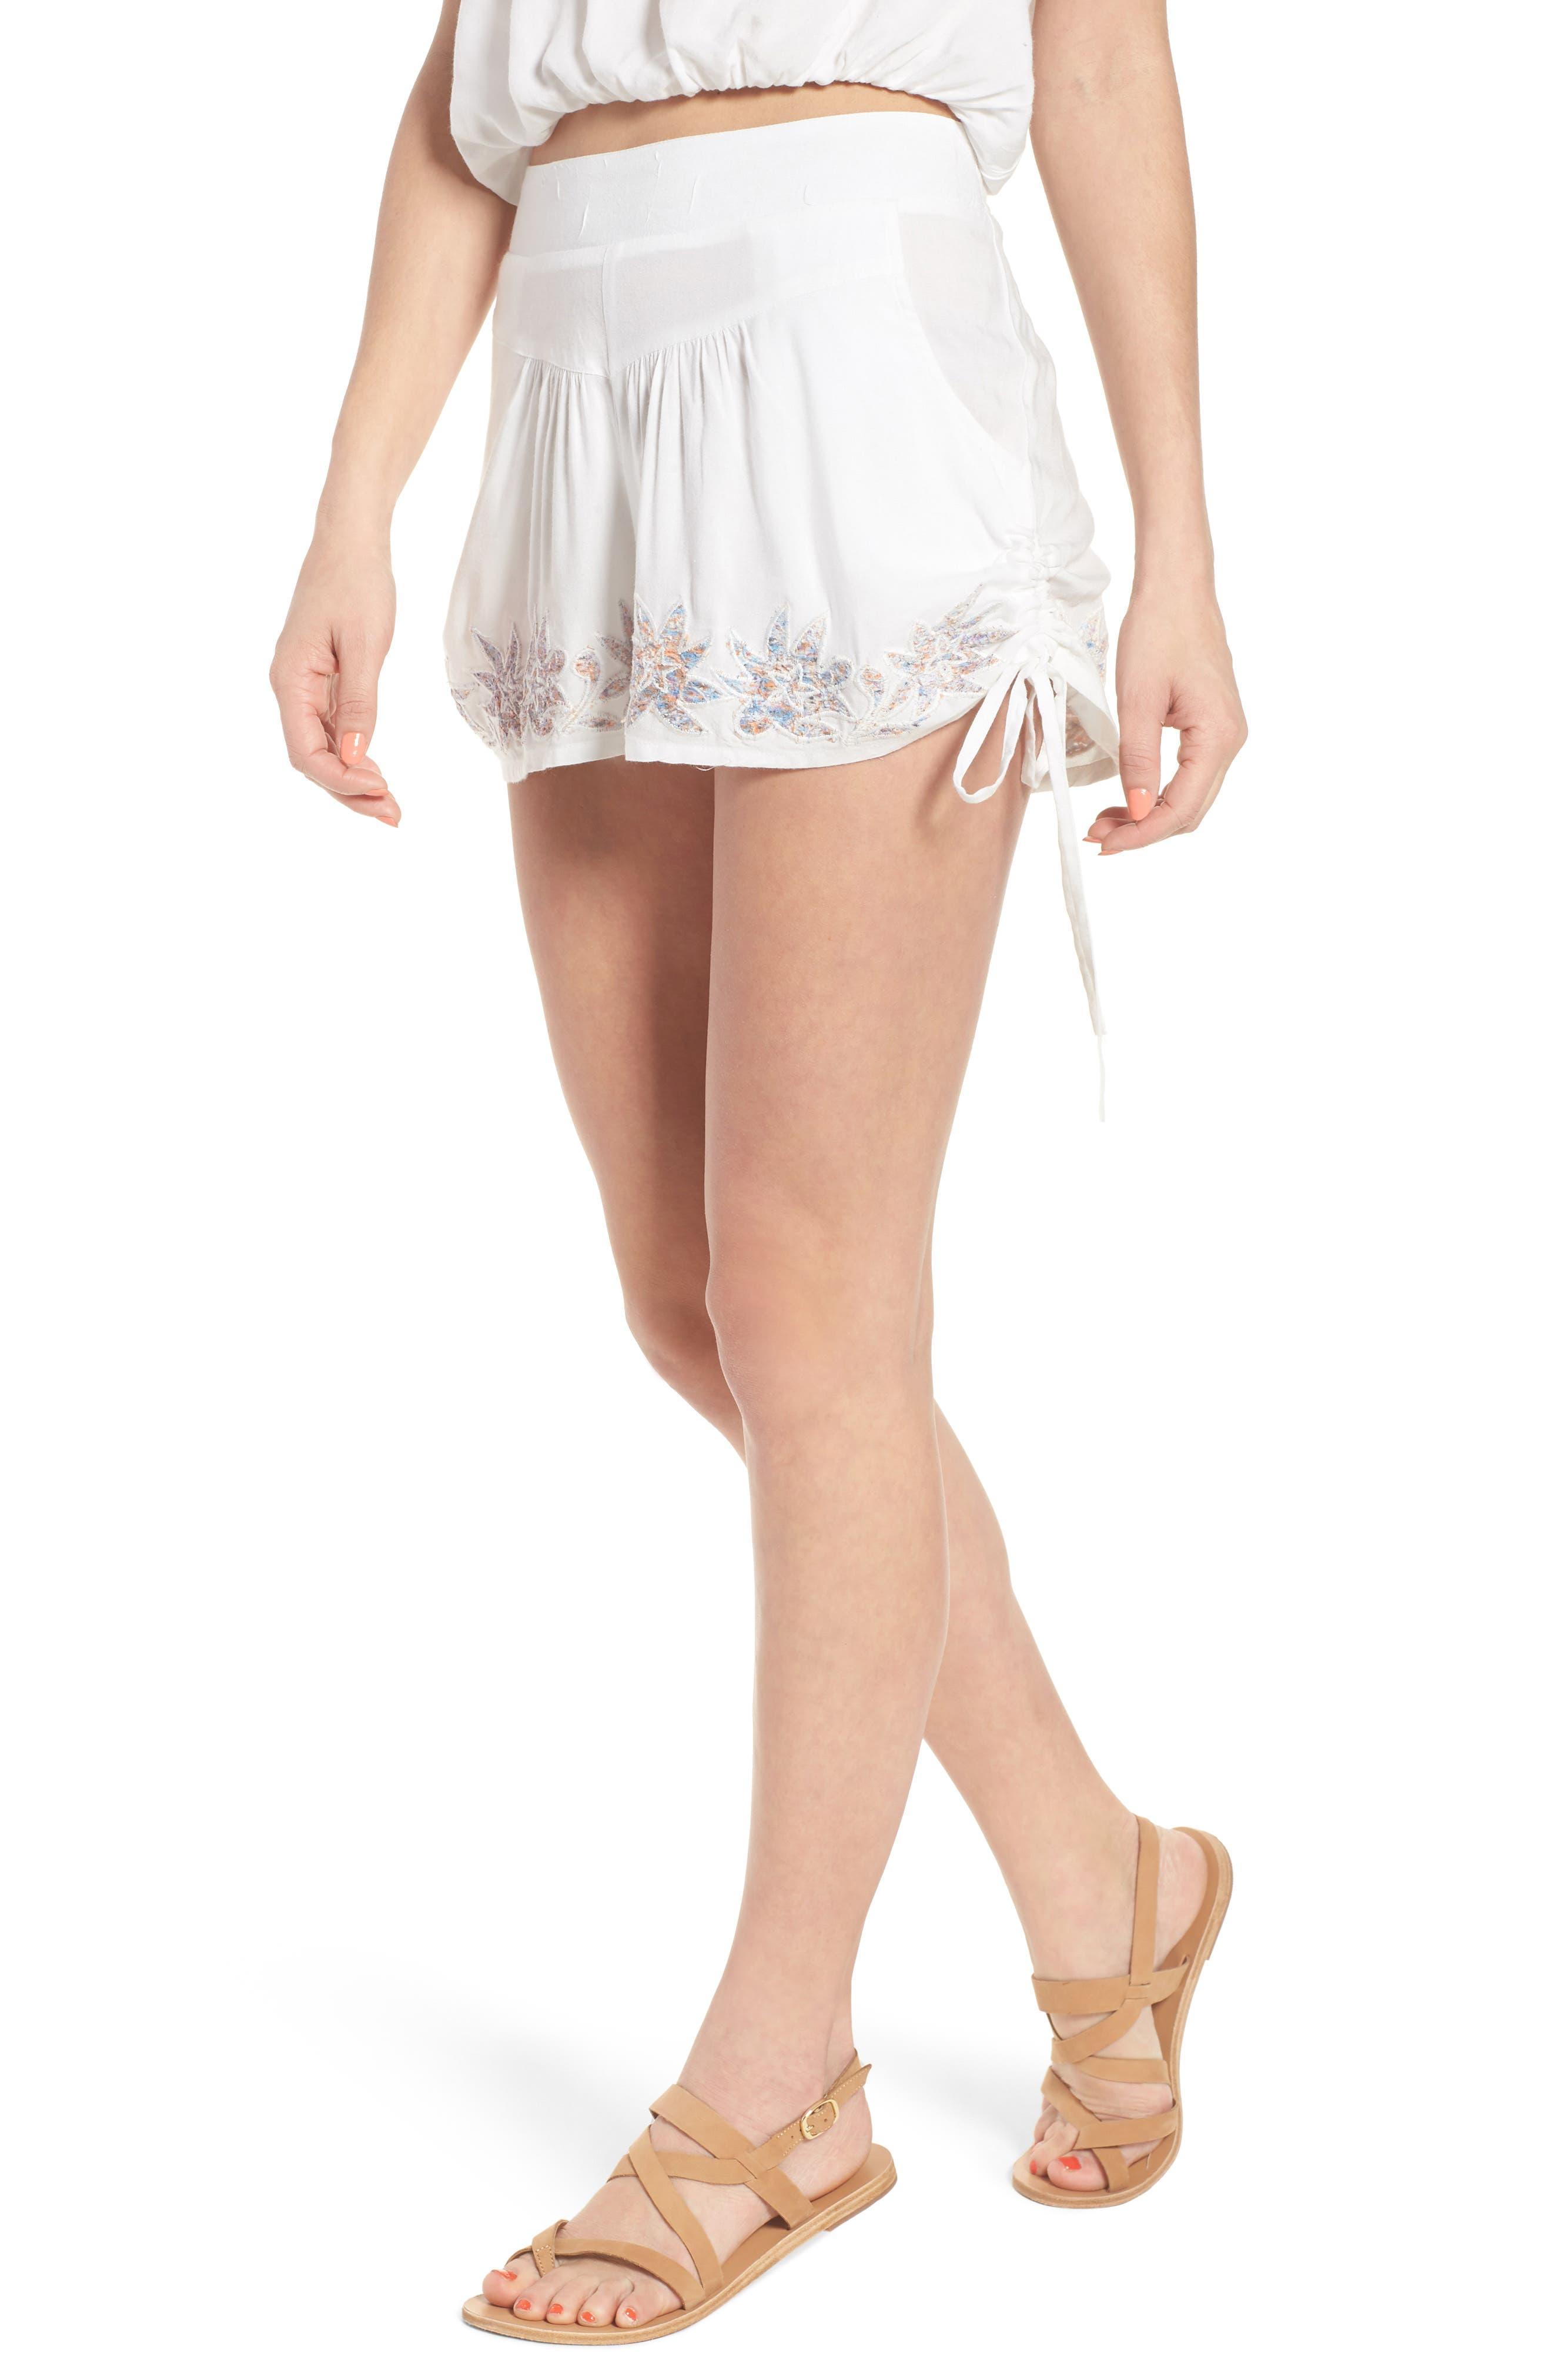 Alternate Image 1 Selected - Raga Lotus Love Side Tie Shorts